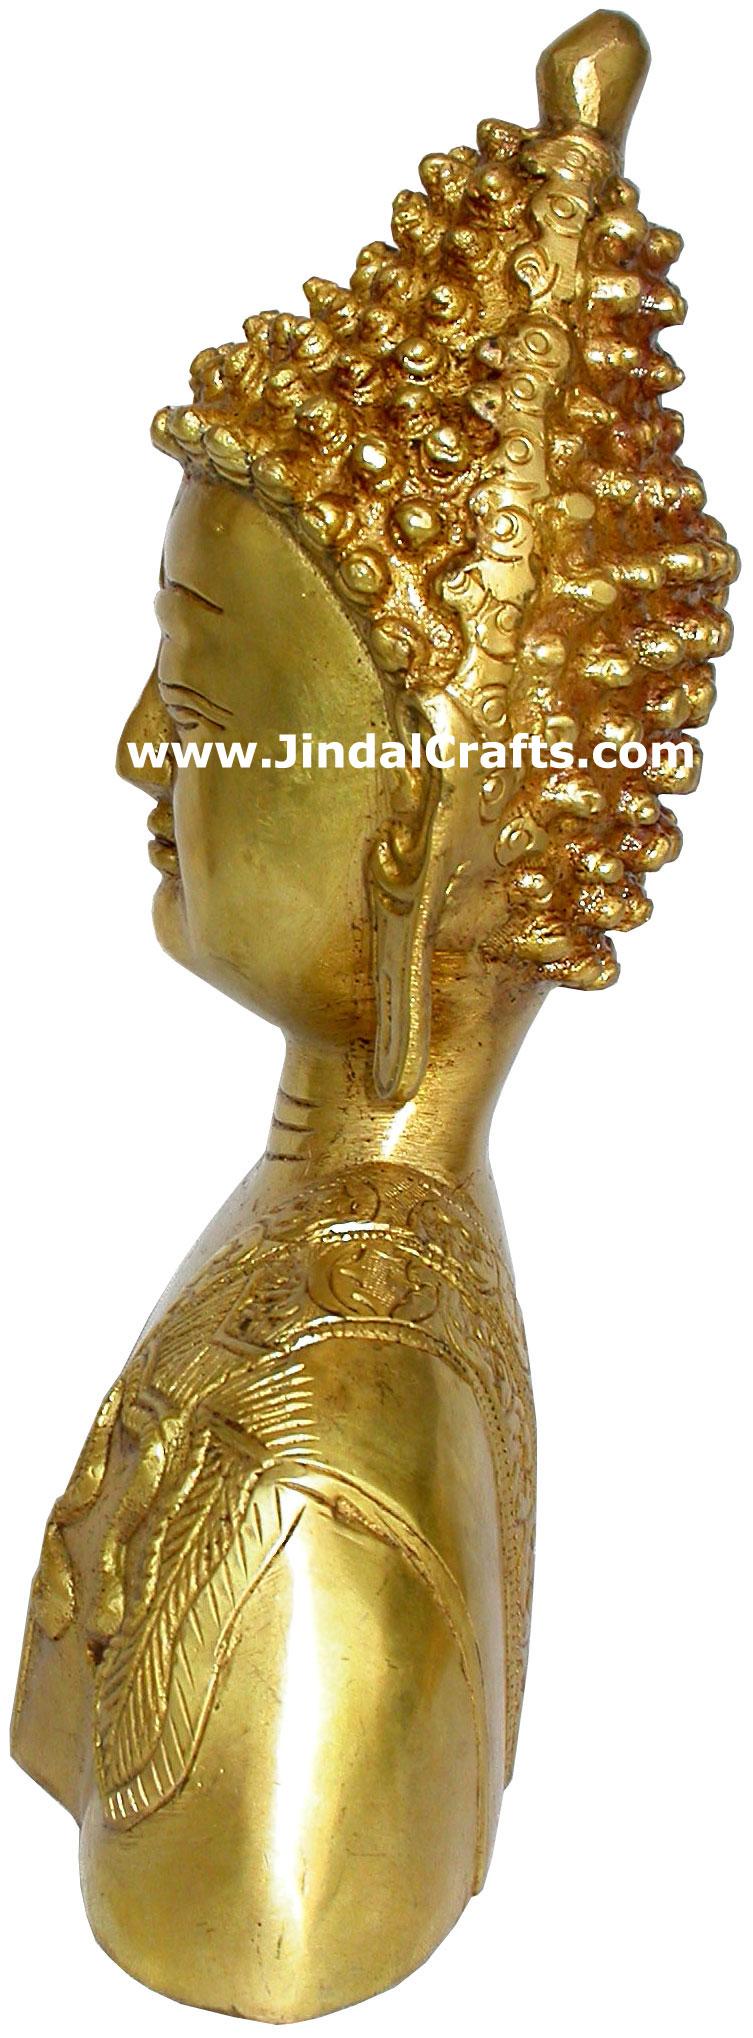 Buddha Bust Hand Carved Indian Art Craft Handicraft Home Decor Brass Figurine